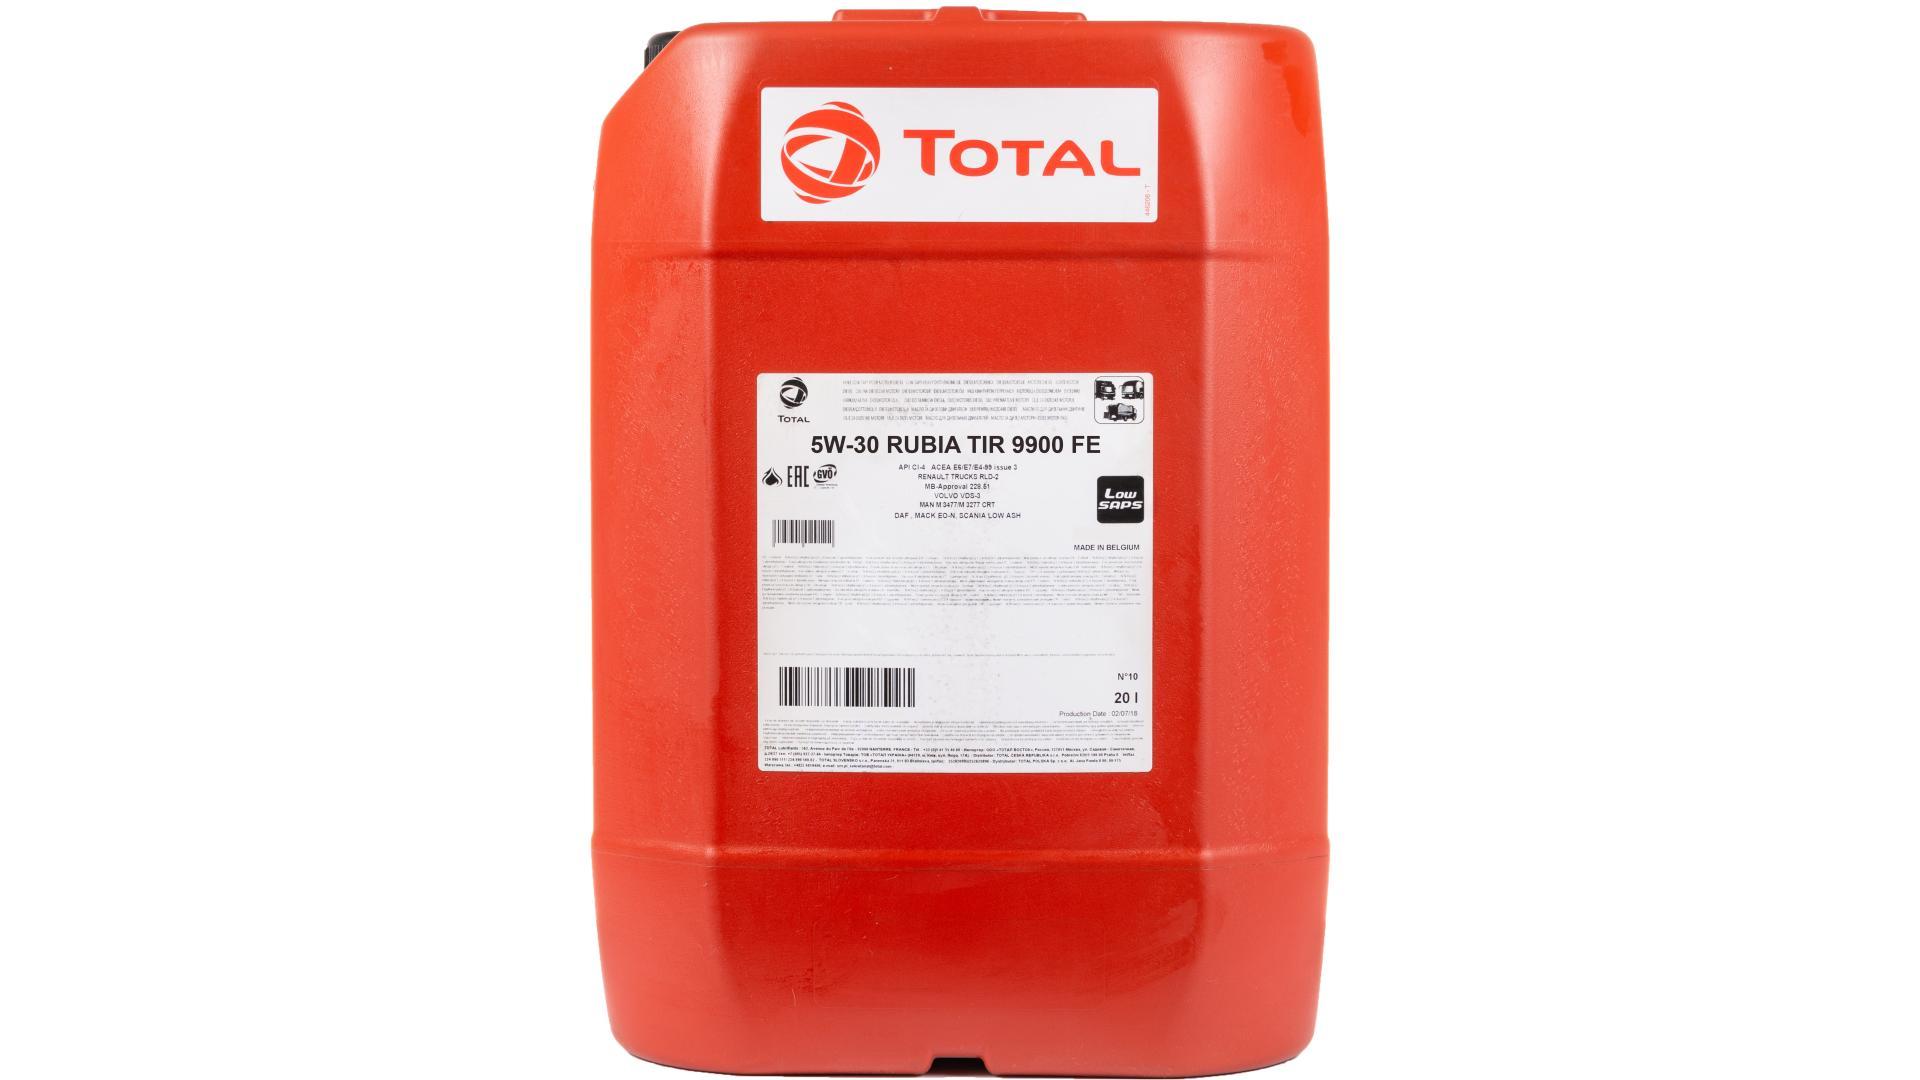 Total 5w-30 RubiaTir9900 FE 20L (174371)